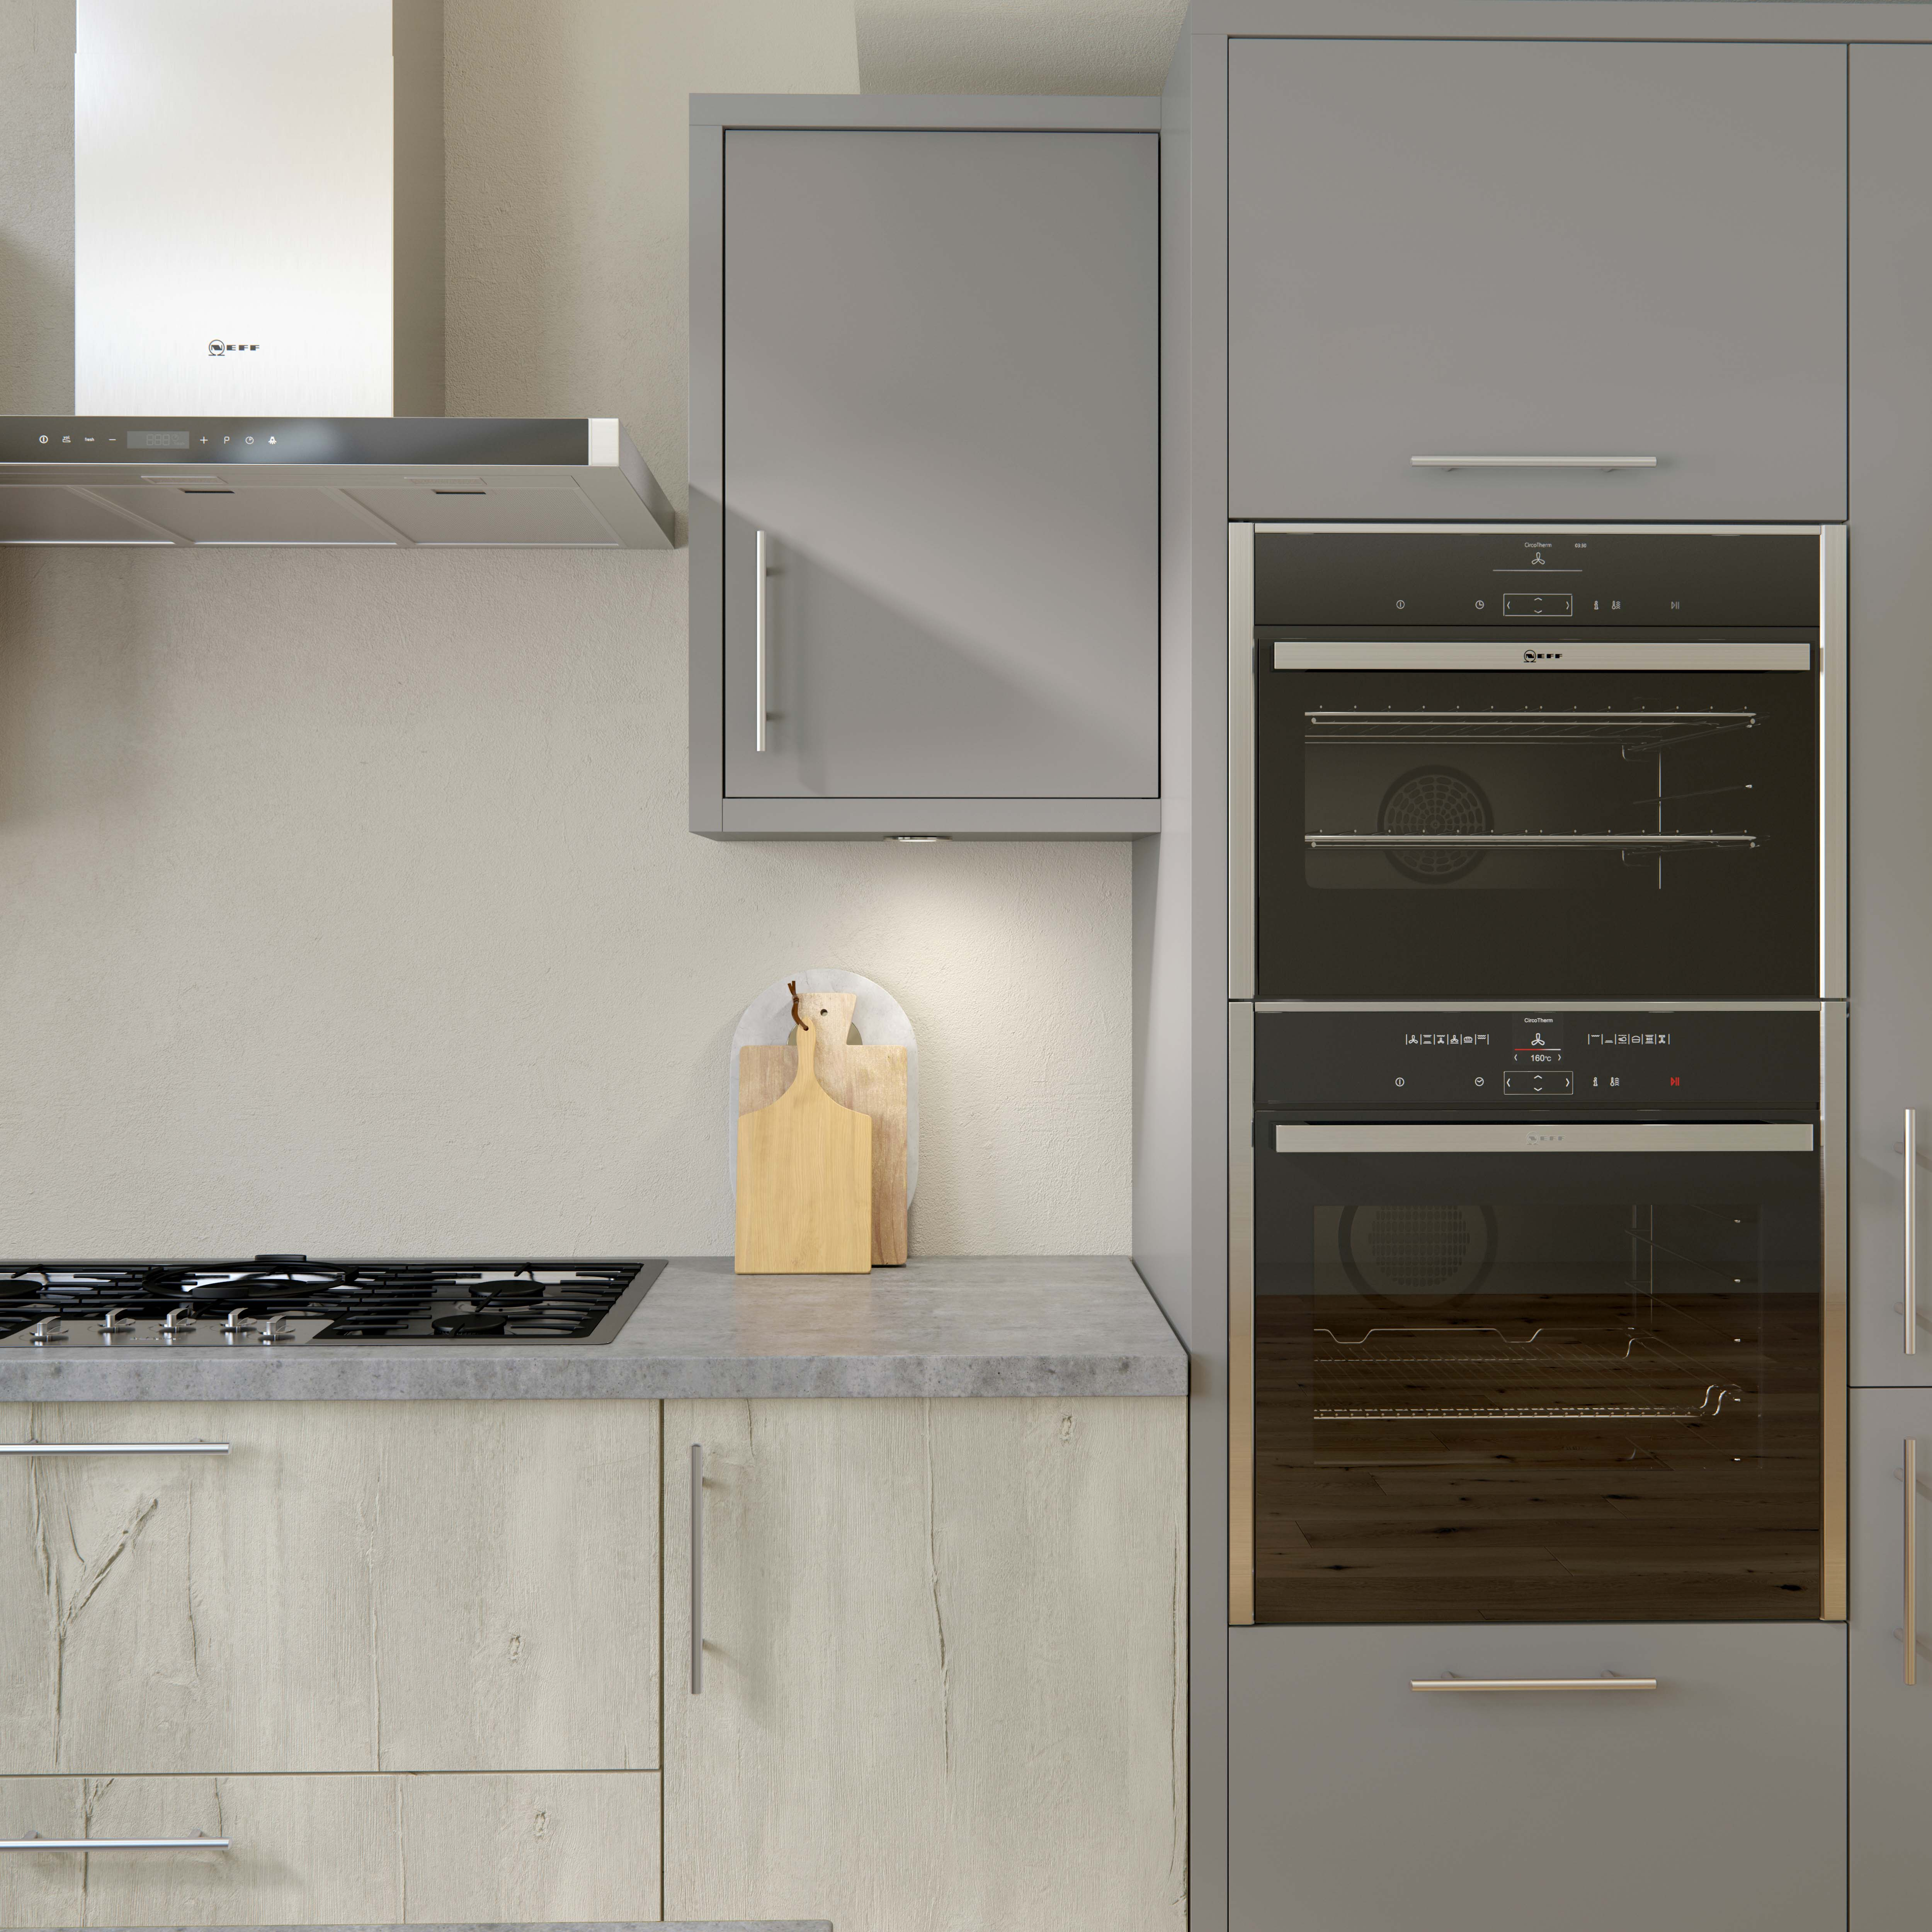 Linden woodgrain kitchen Crestwood of Lymington